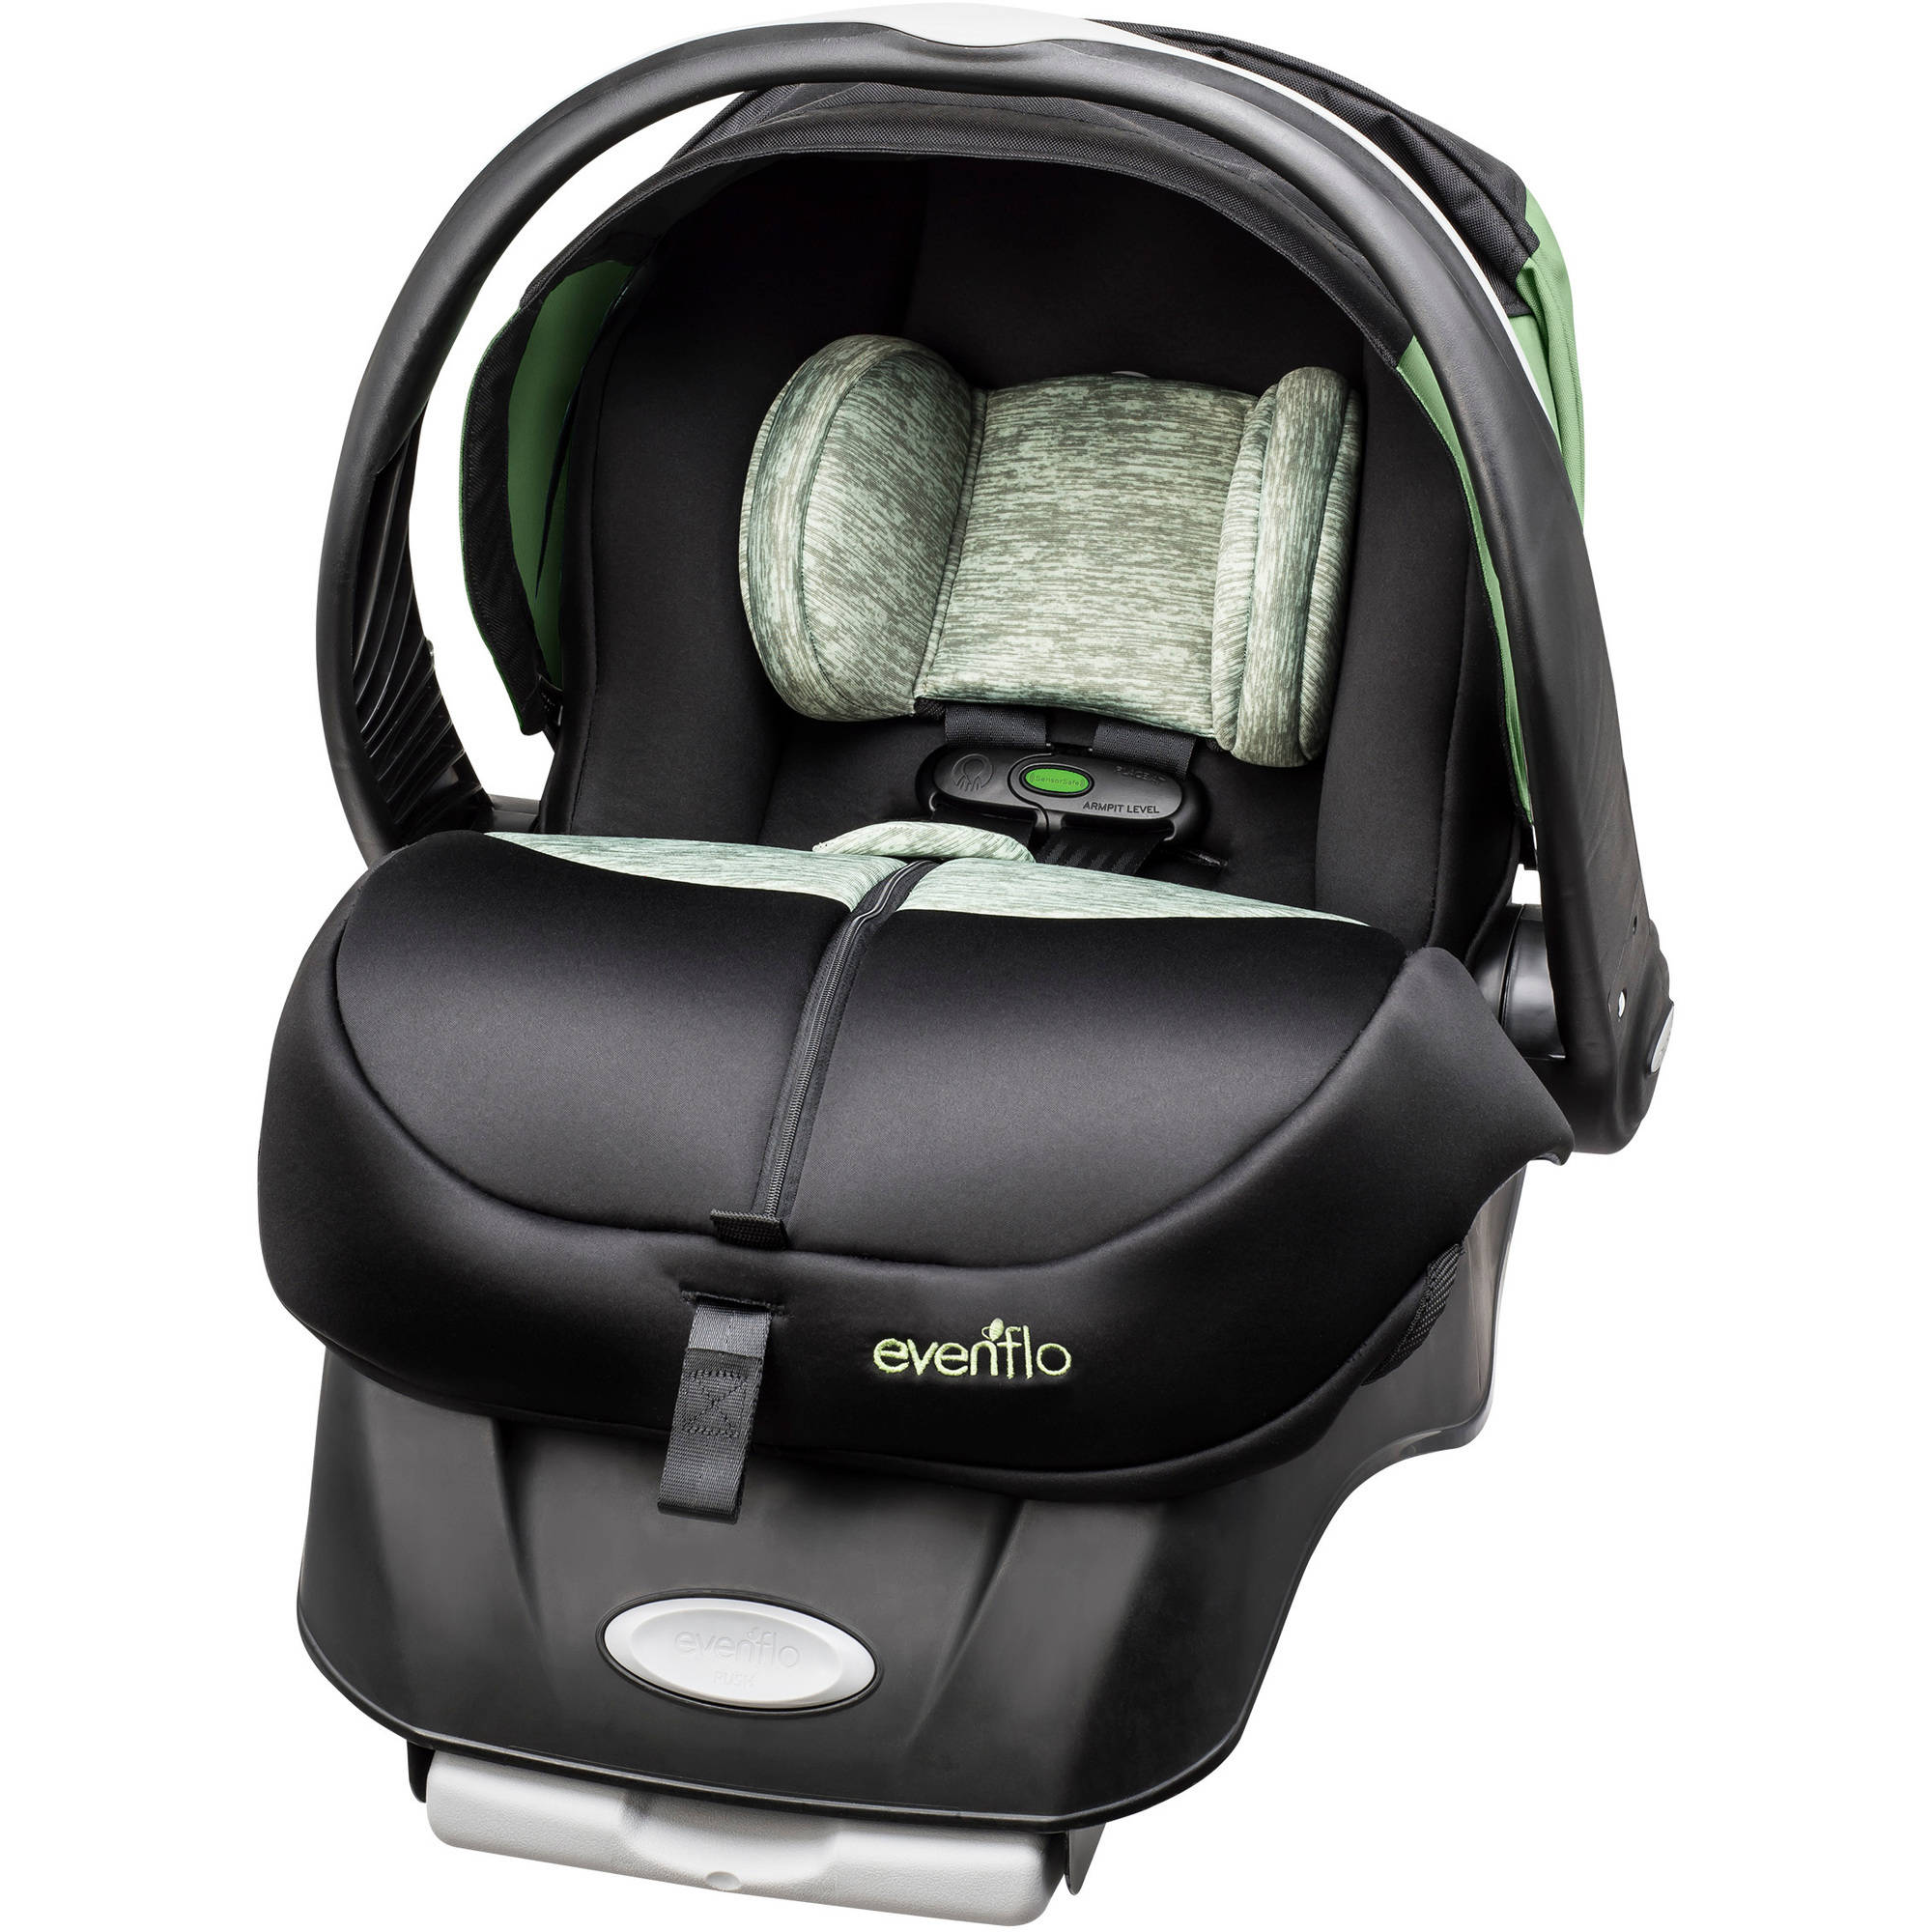 Evenflo Advanced Embrace DLX Infant Car Seat with SensorSafe Choose